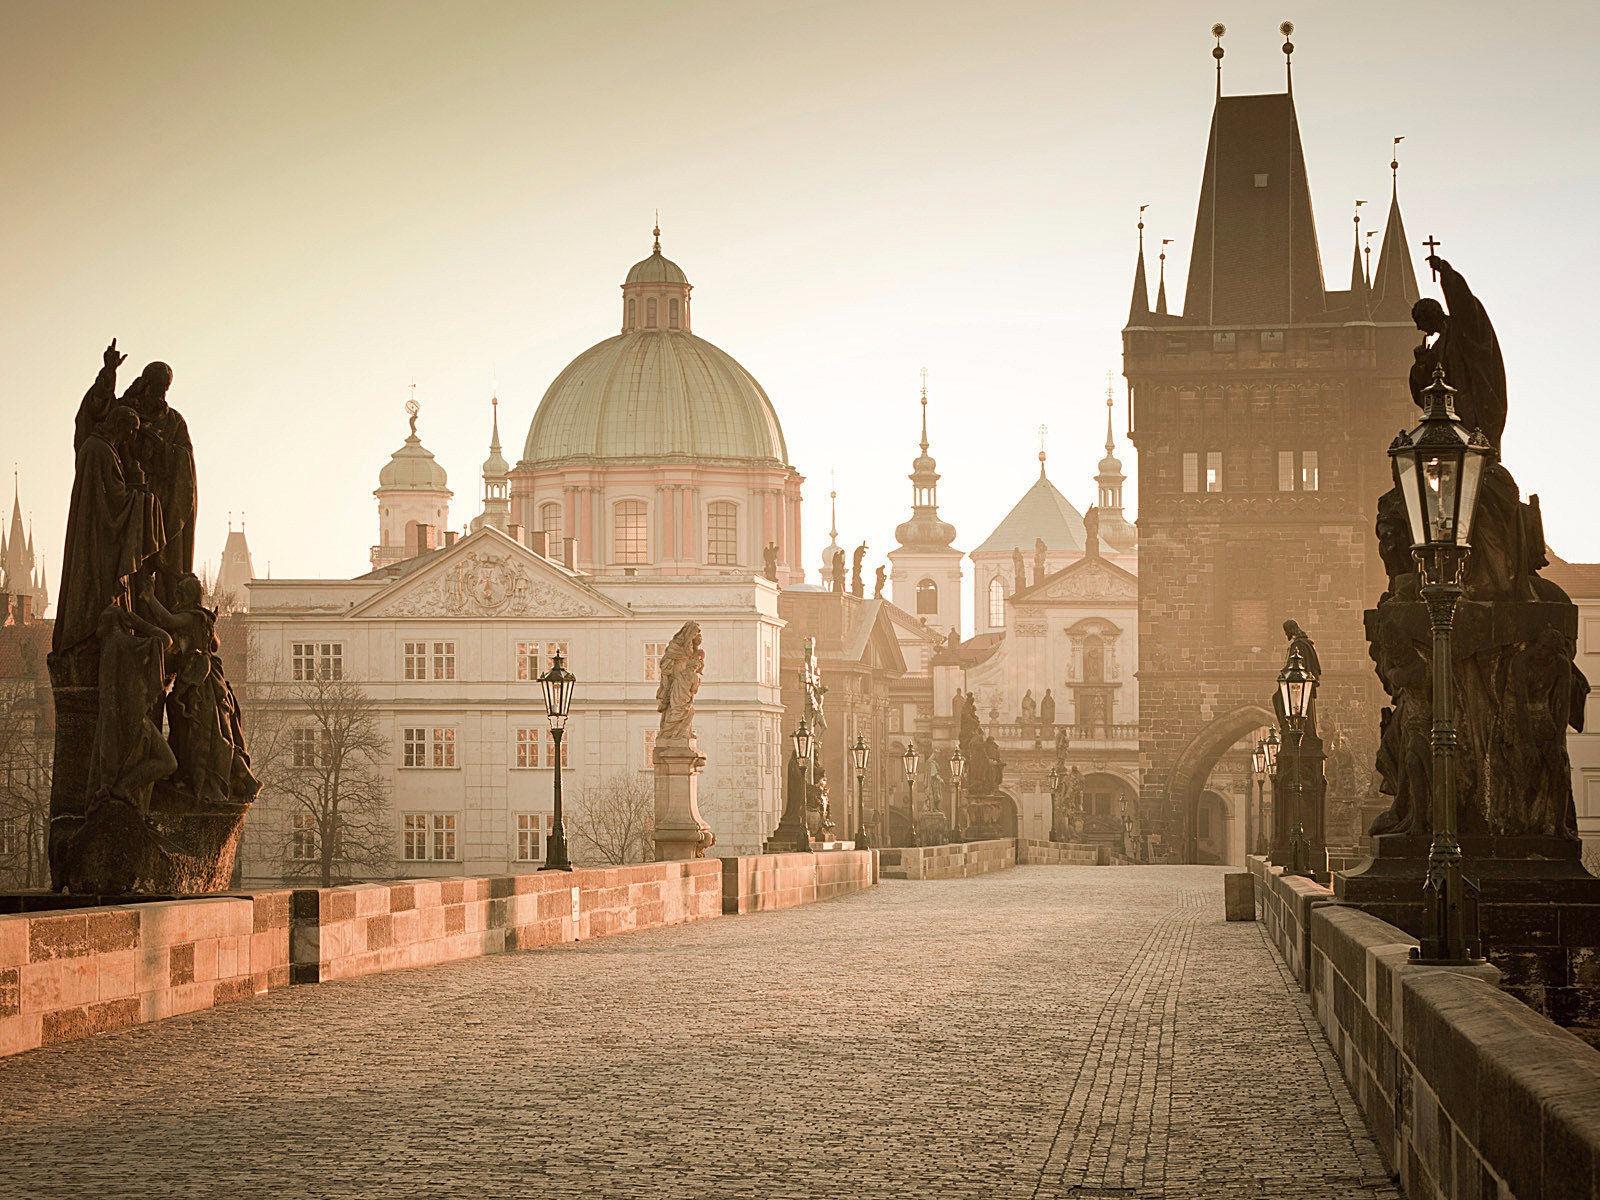 Flash Promosyon Orta Avrupa ( Viyana & Prag & Budapeşte)  3* & 4* Oteller 7 gece Konaklama Turu